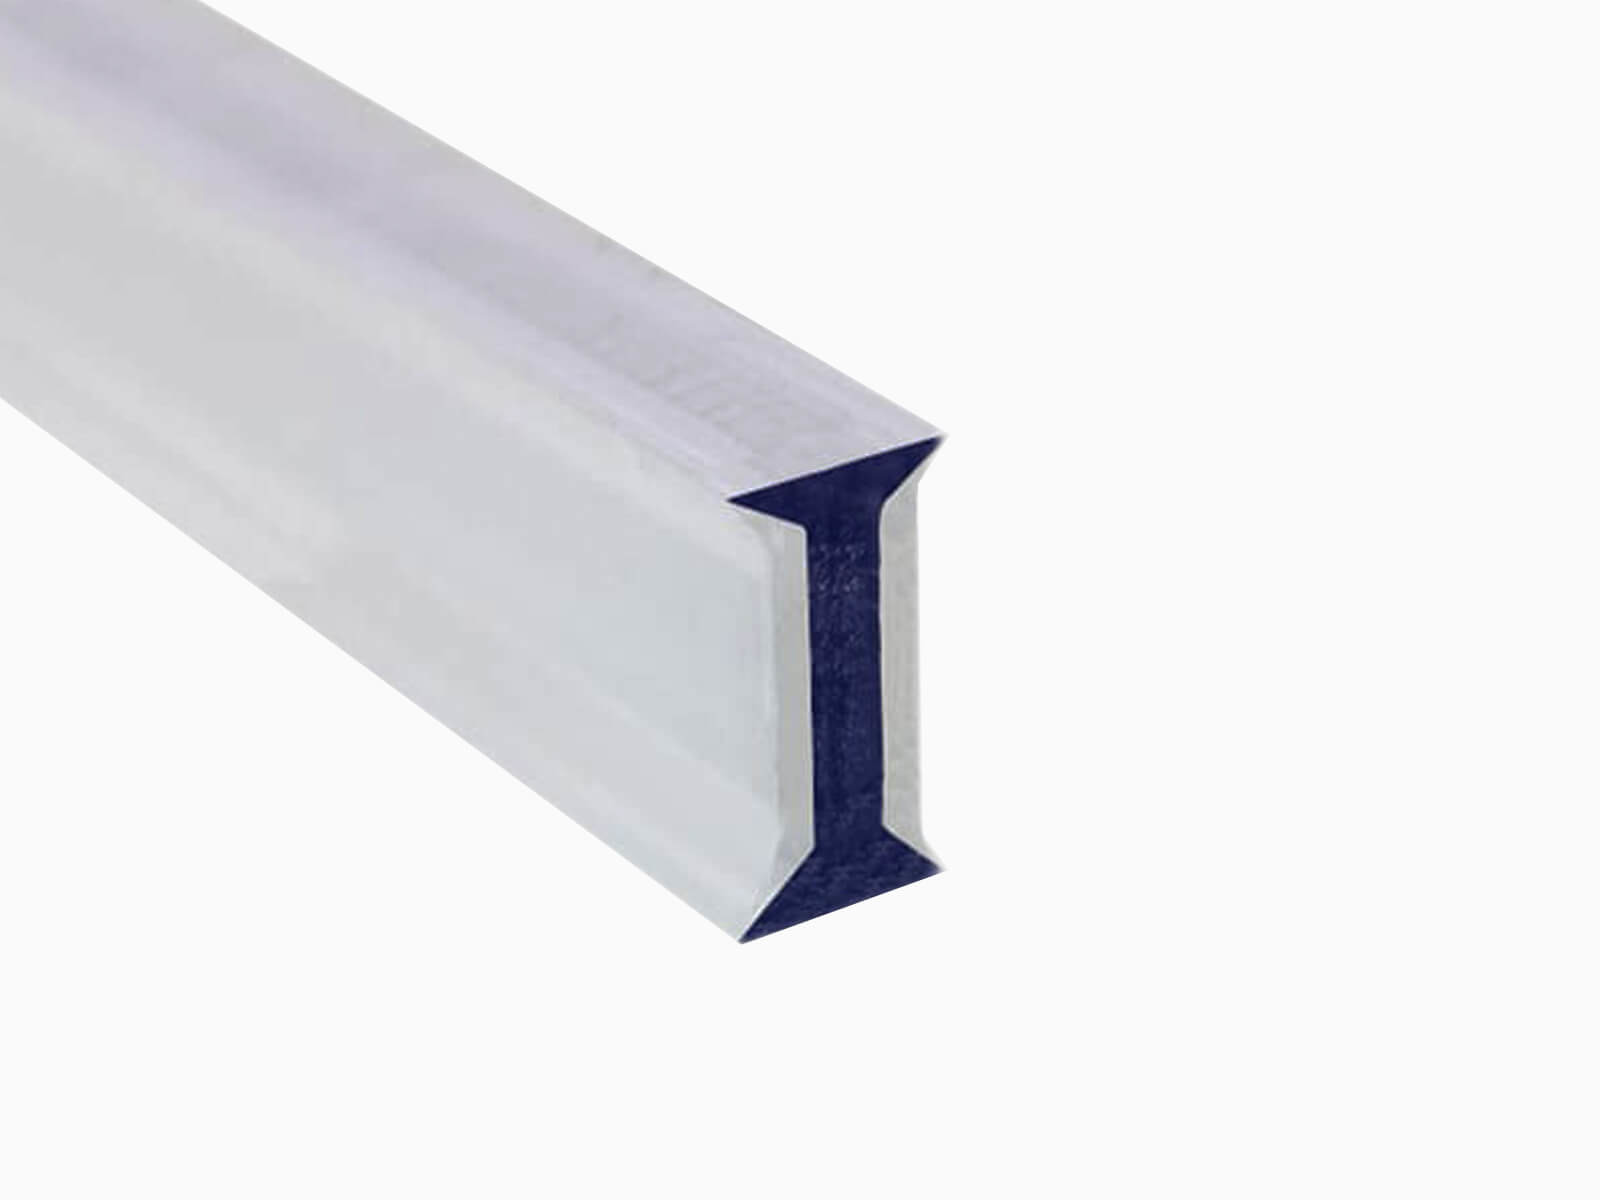 kunststoffprofil-für-glastrennwand-im-industrie-look